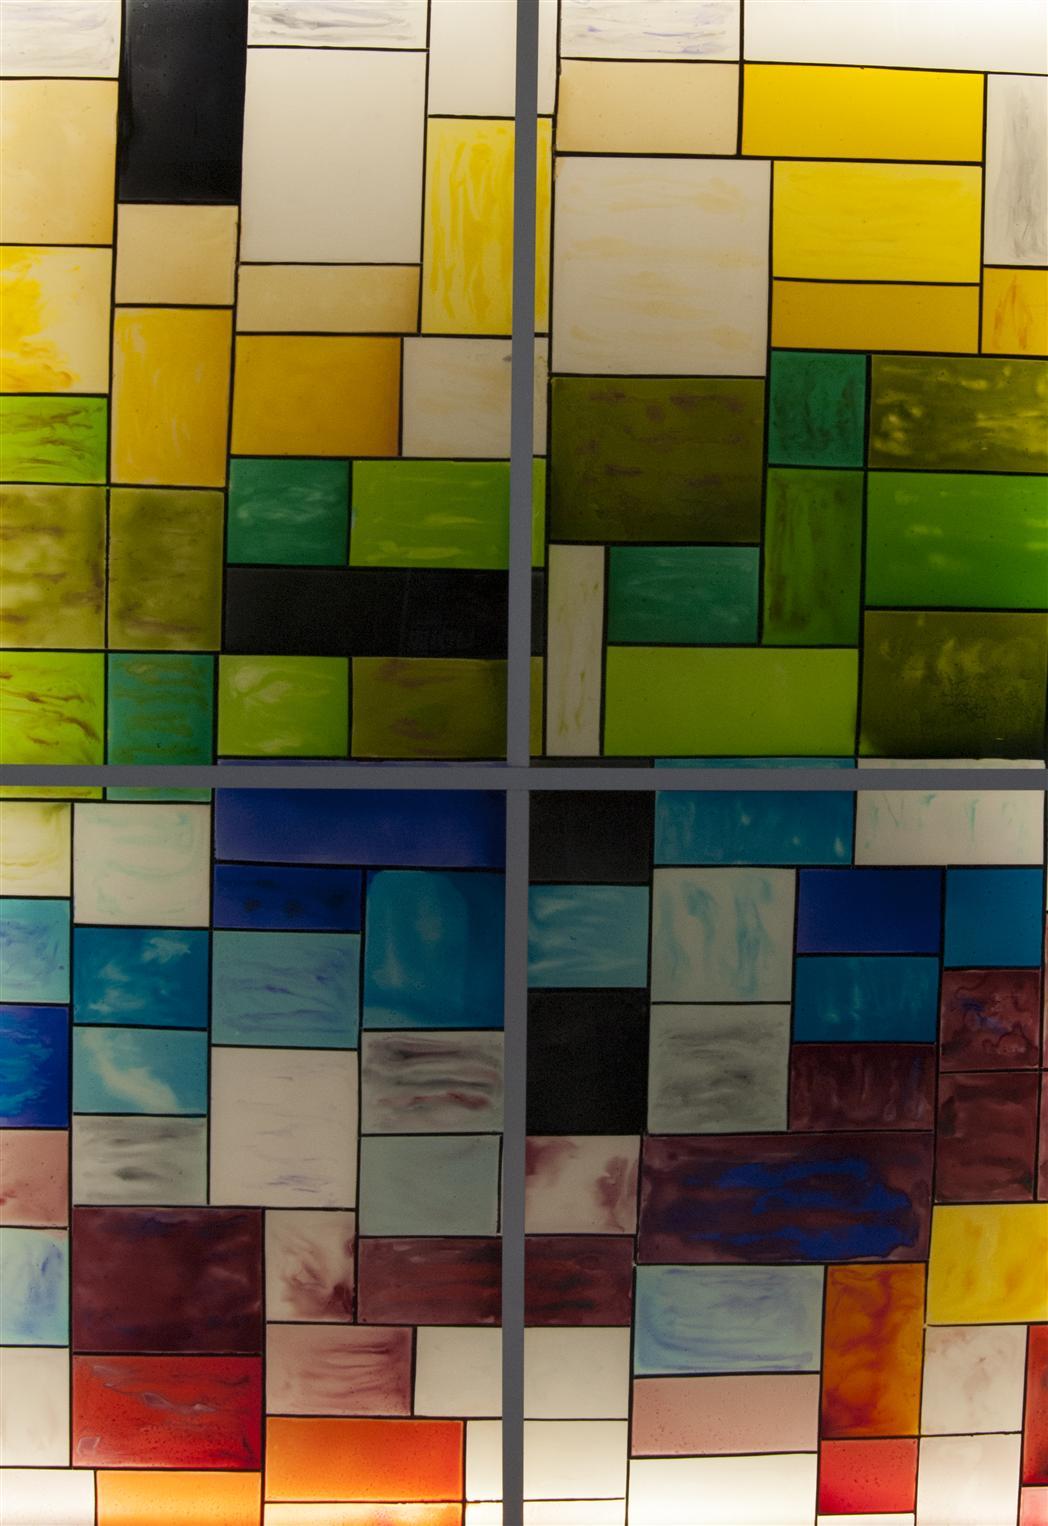 ahmet-bey-vilasi2015921173058762.jpg izmir vitray çalışması